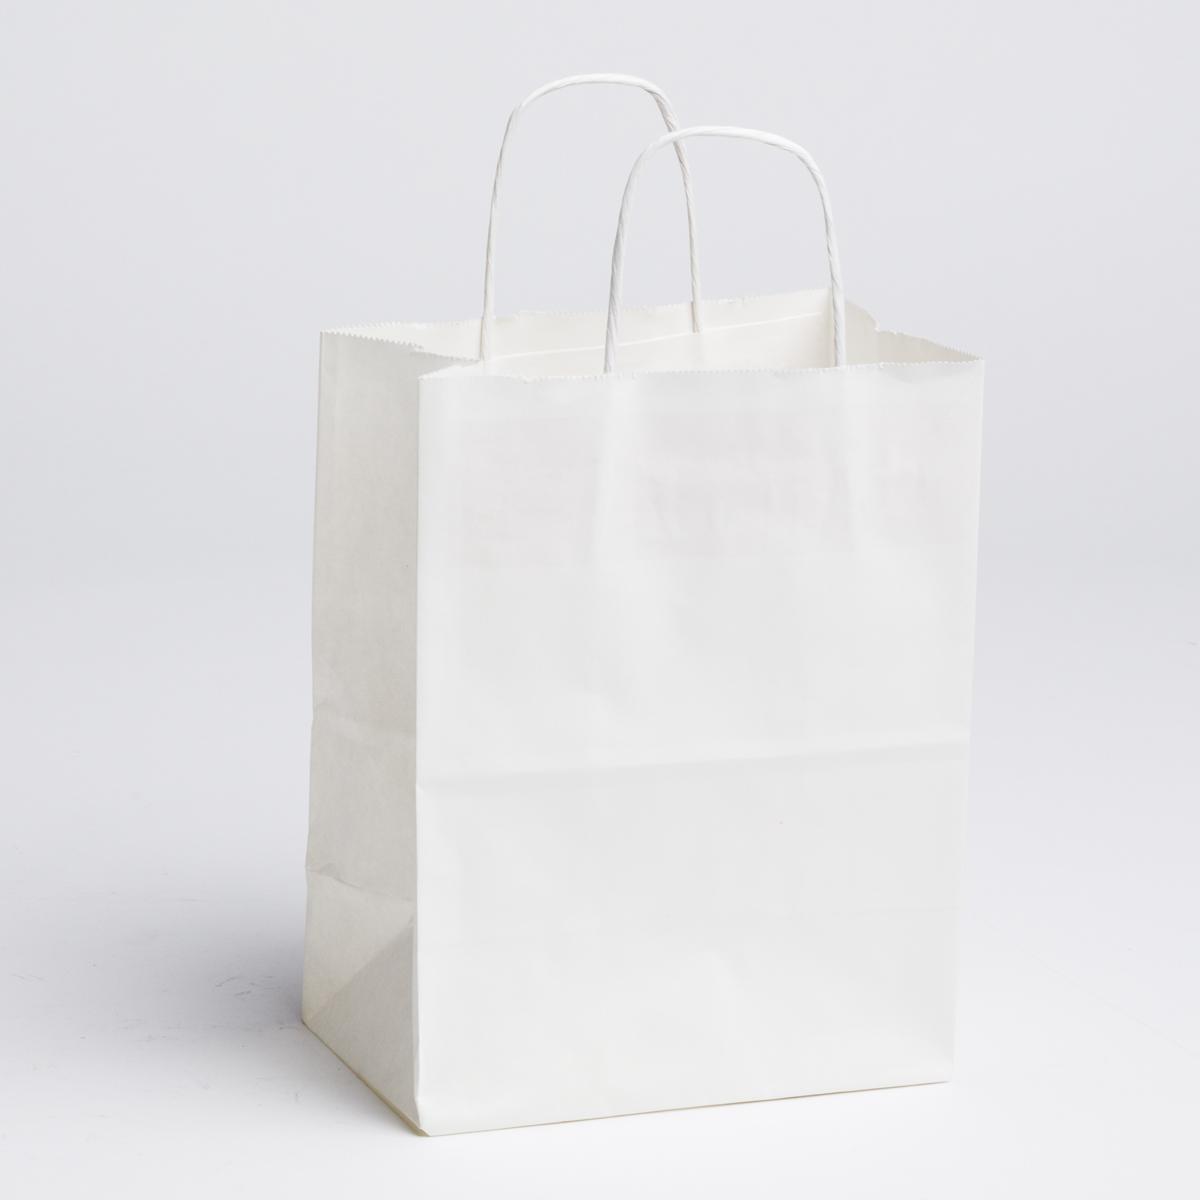 Medium White Paper Ping Bags 100 Pcs